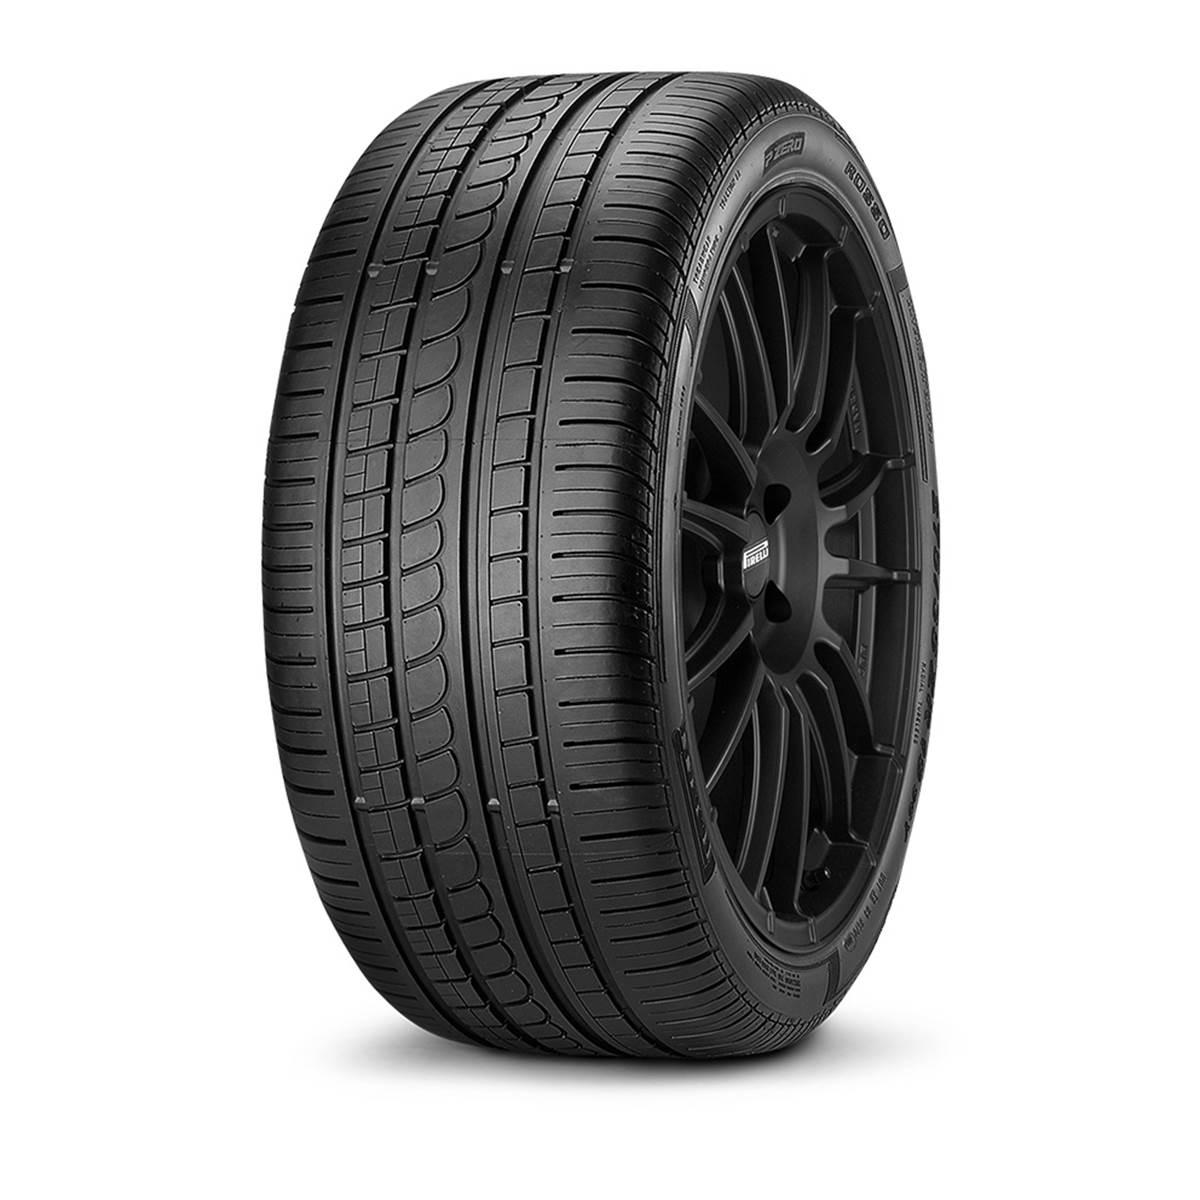 Pneu Pirelli 255/30R21 93Y Pzero Nero (Gt) XL